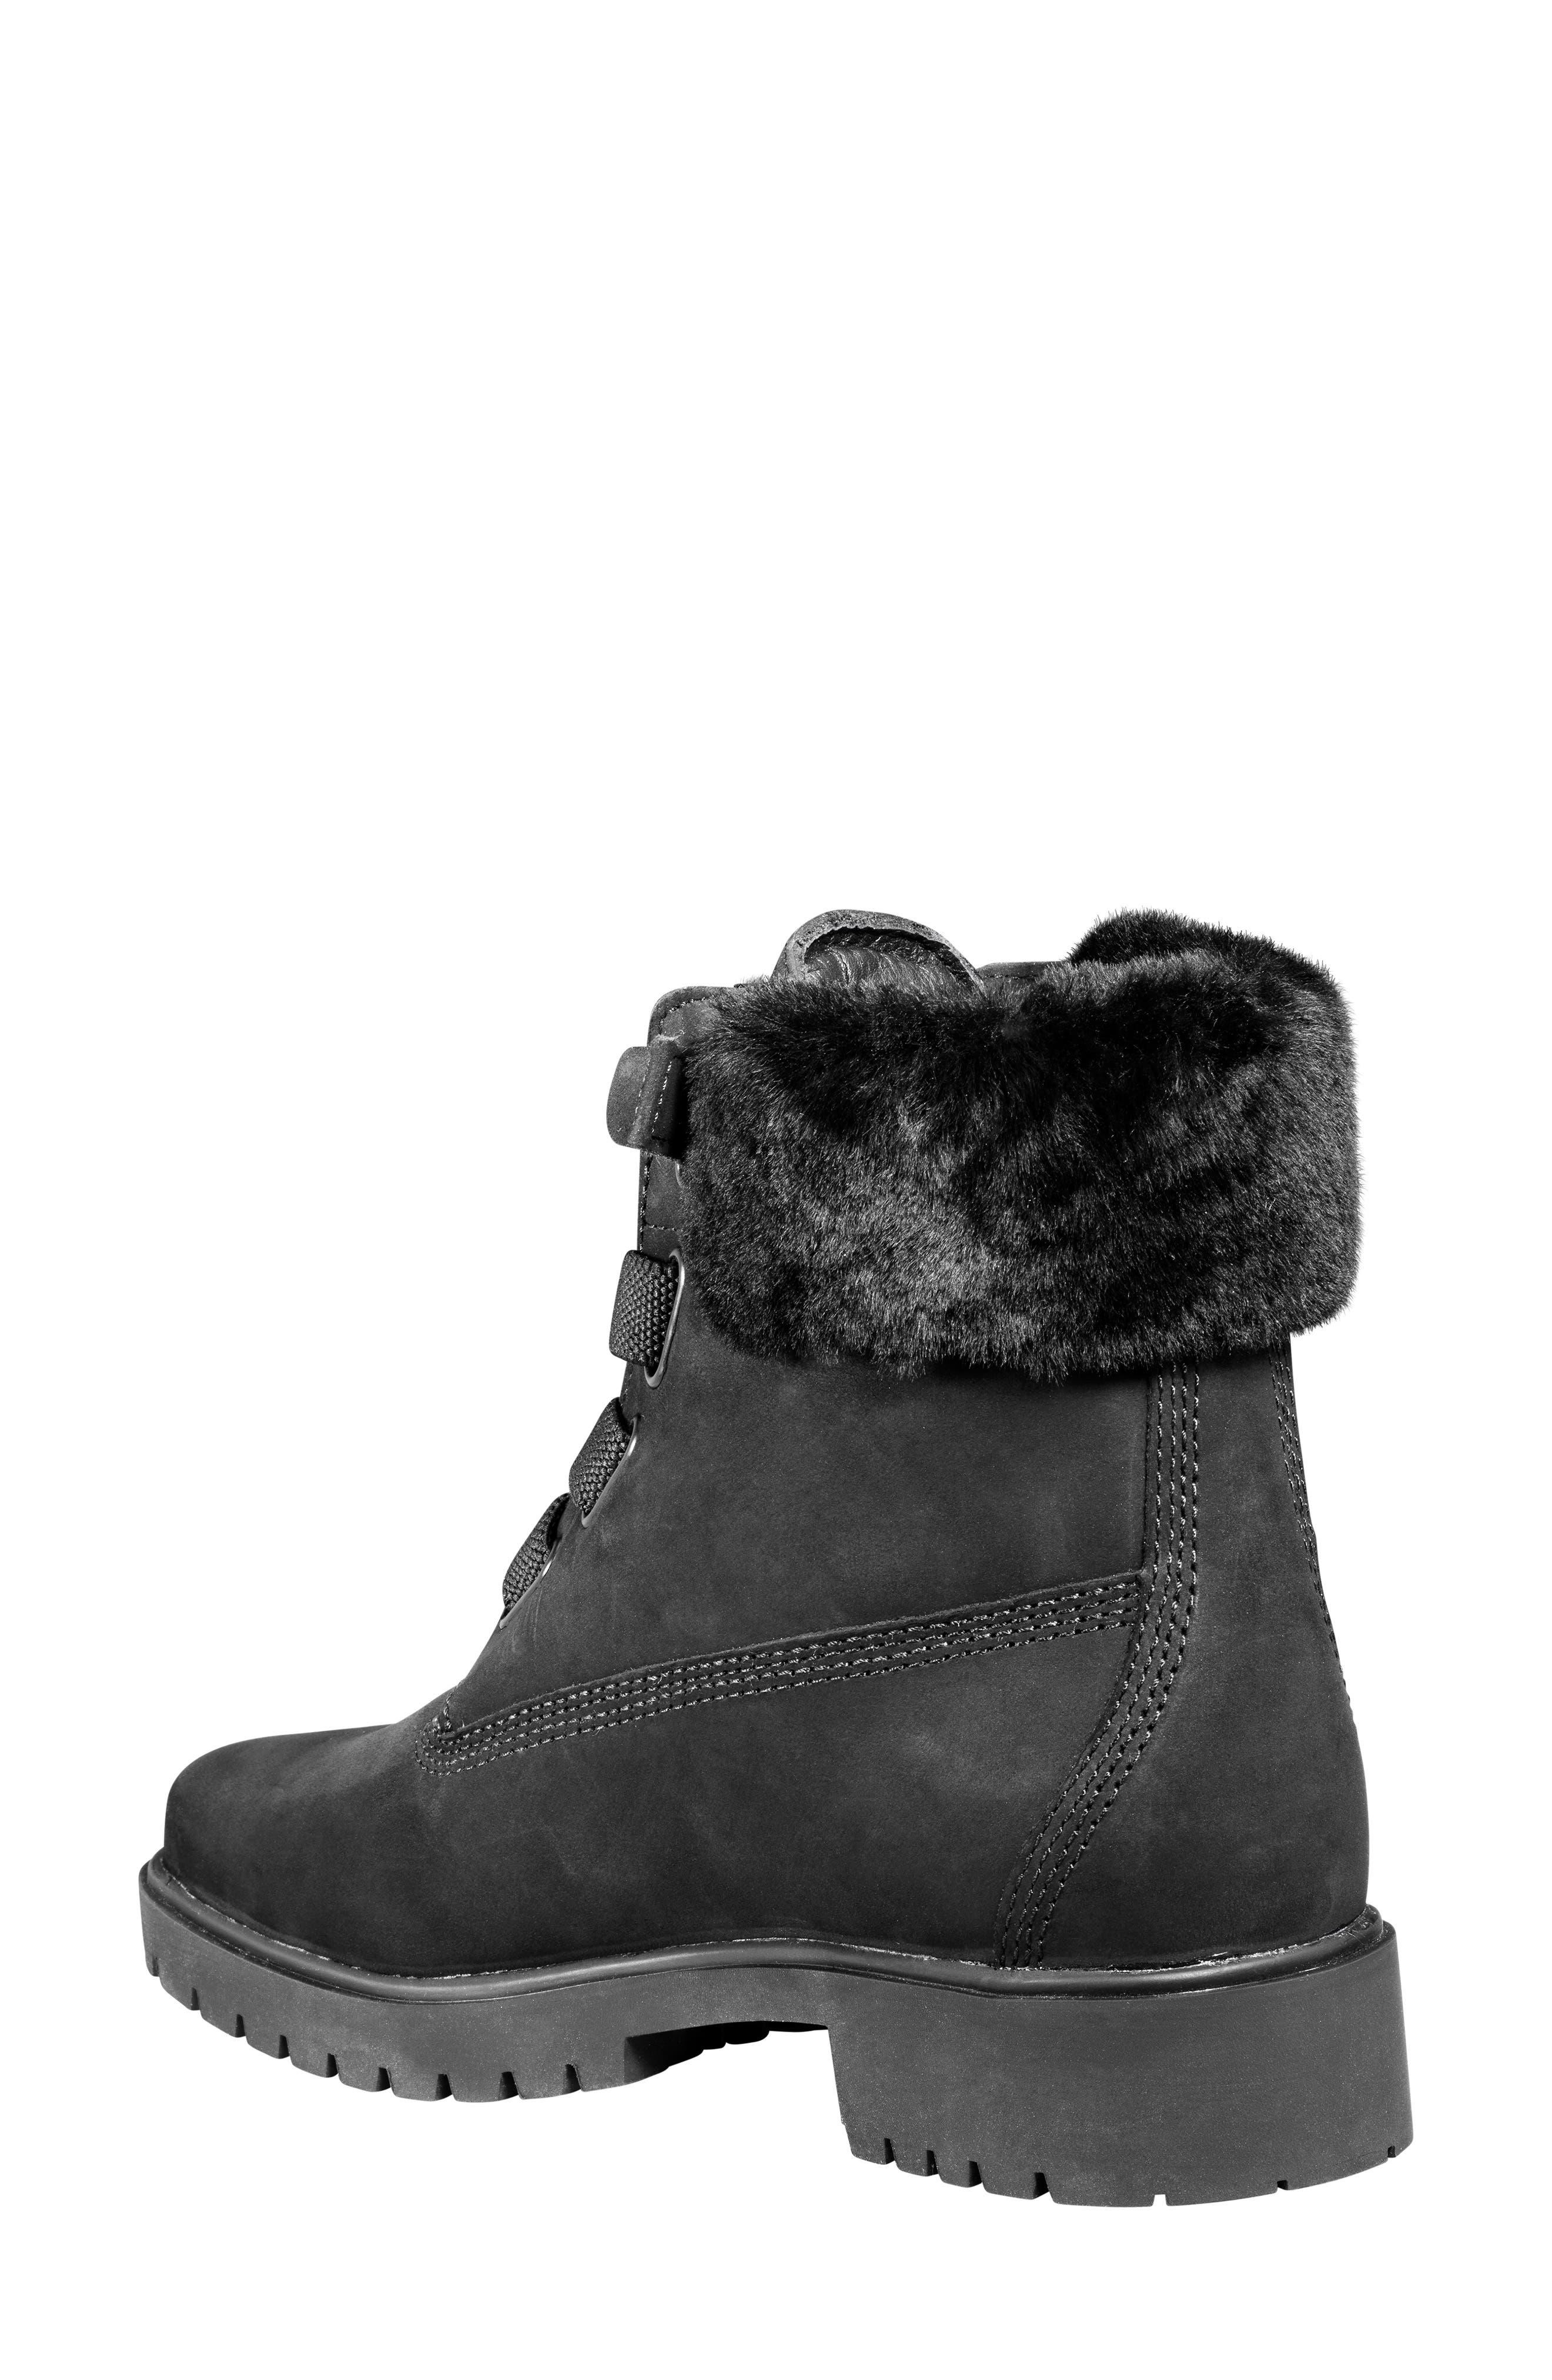 Women's Timberland Winter & Snow Boots | Nordstrom